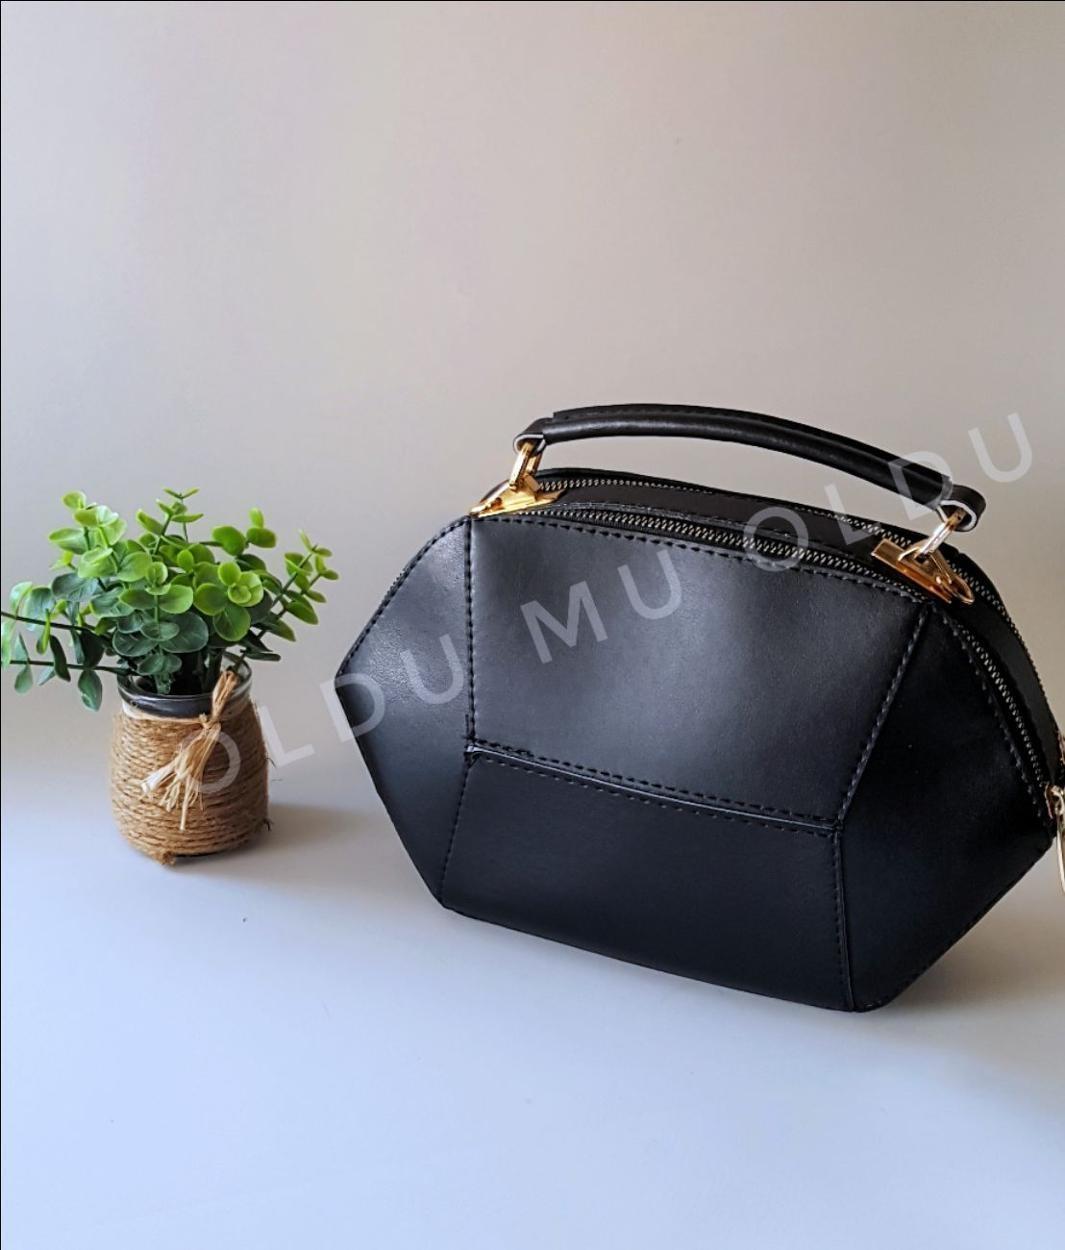 Diğer Portföy/El çantası